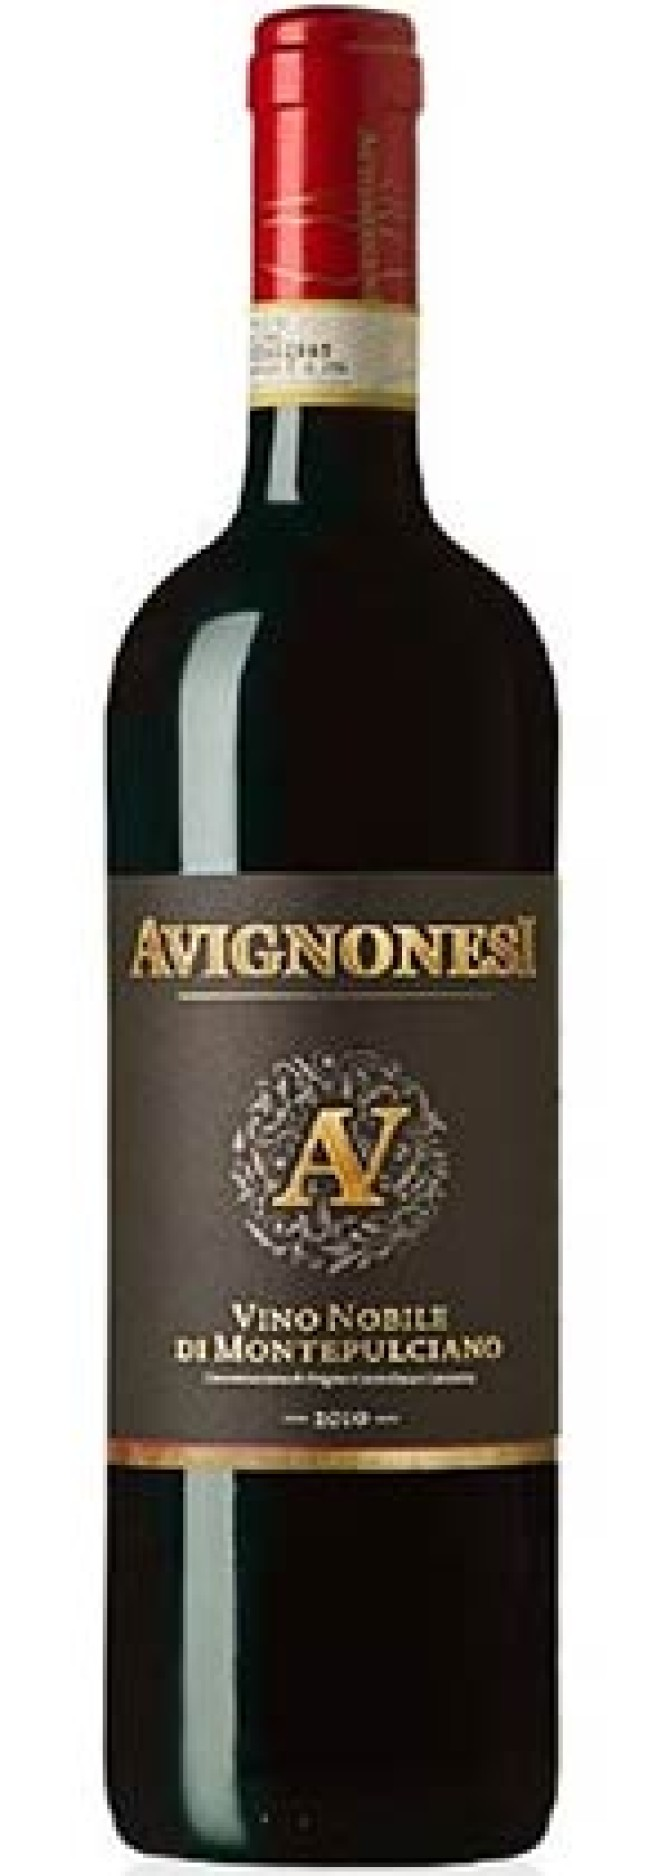 avignonesi-vino-nobile